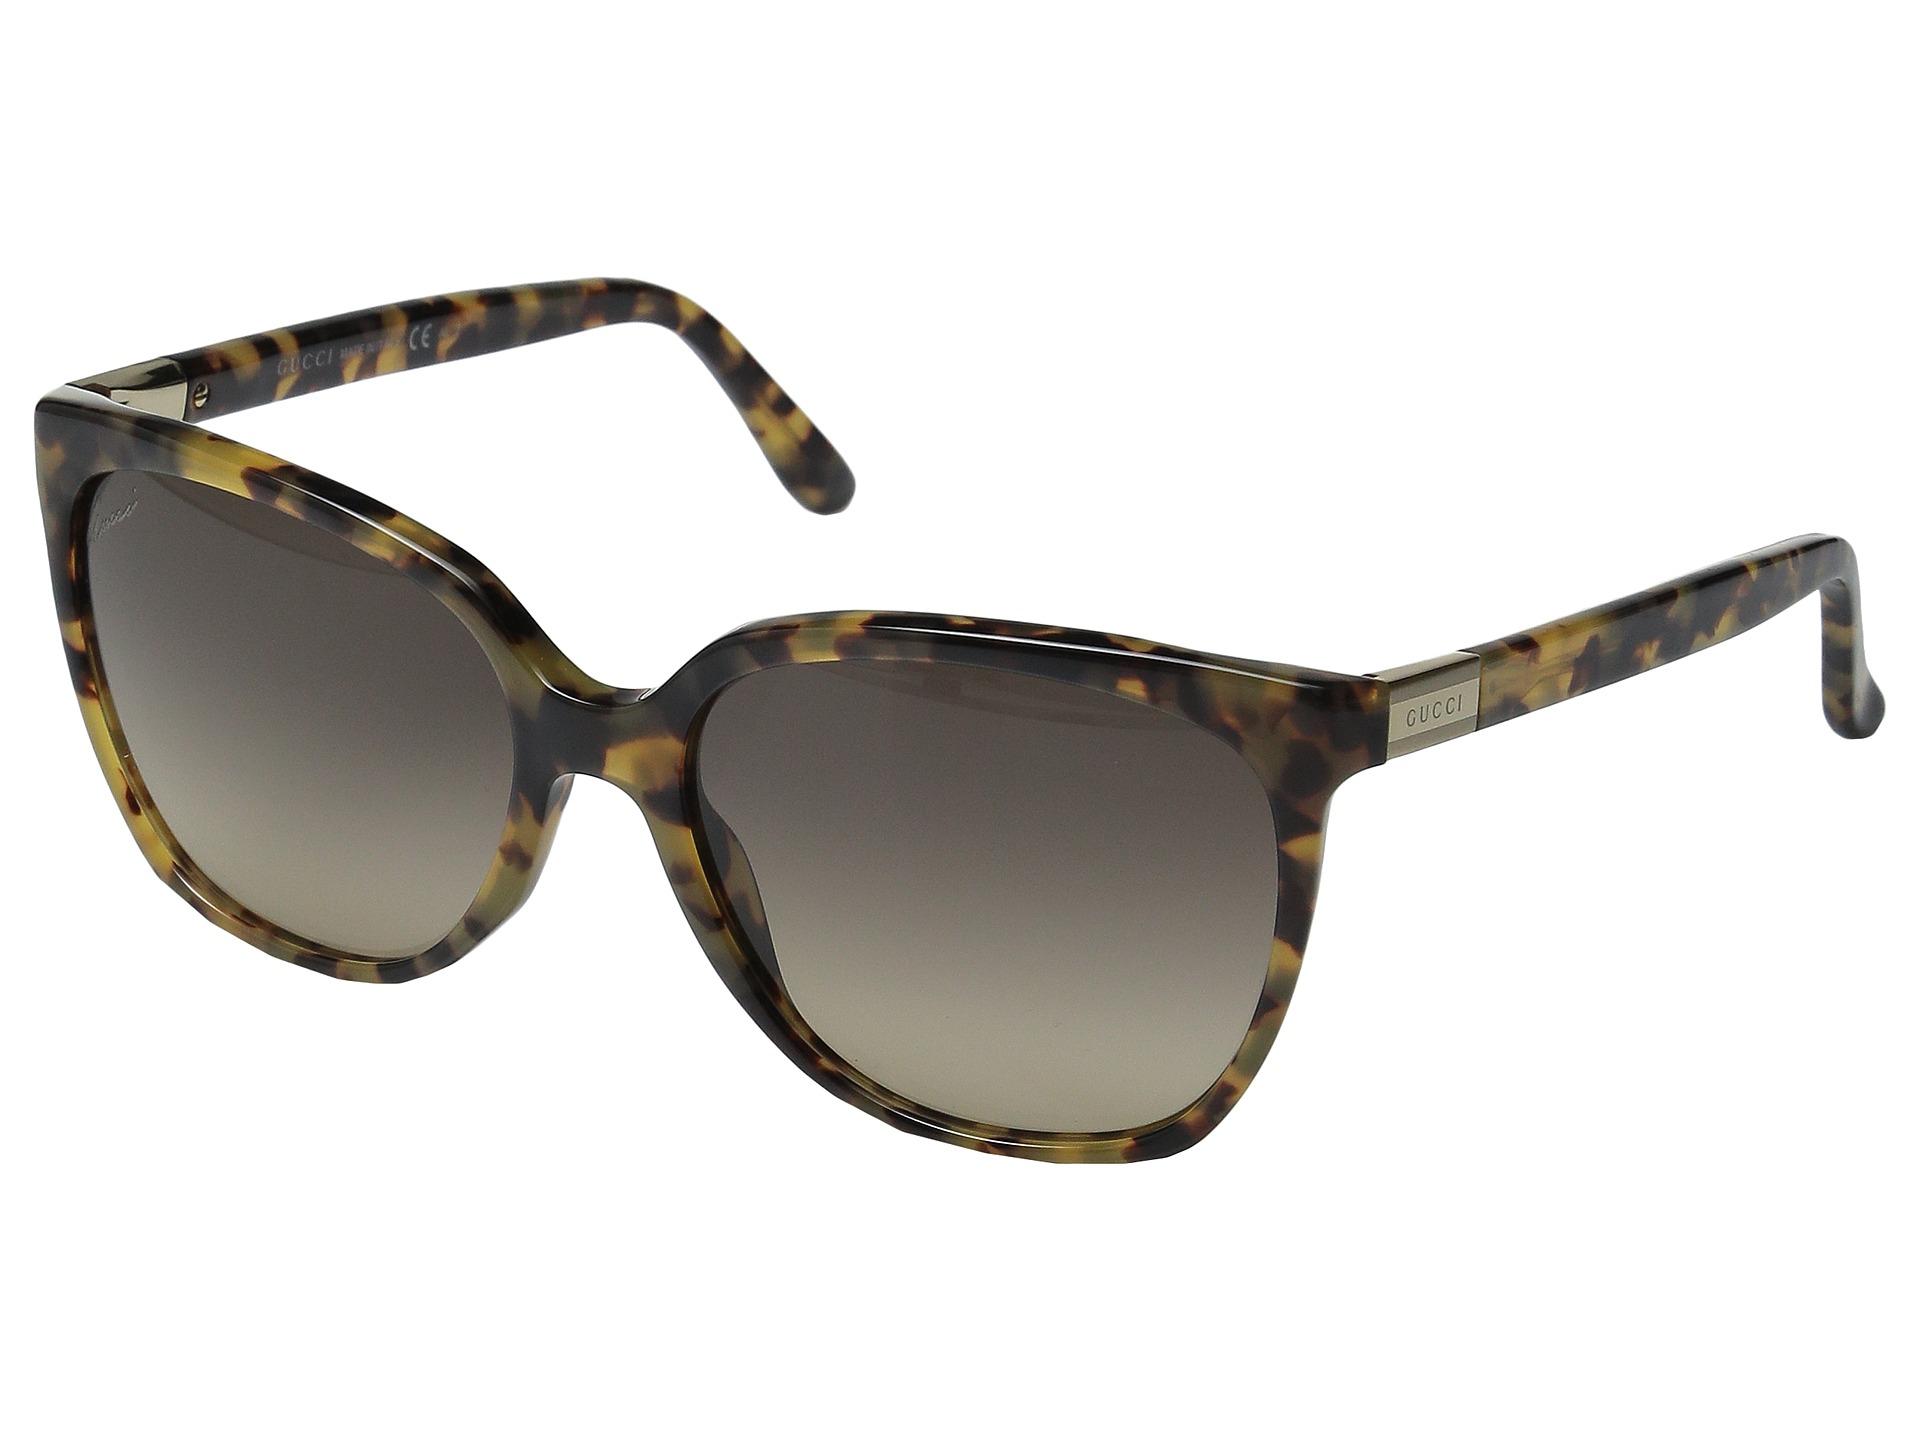 42160763d70e0 Lyst - Gucci Gg 3502 s in Brown